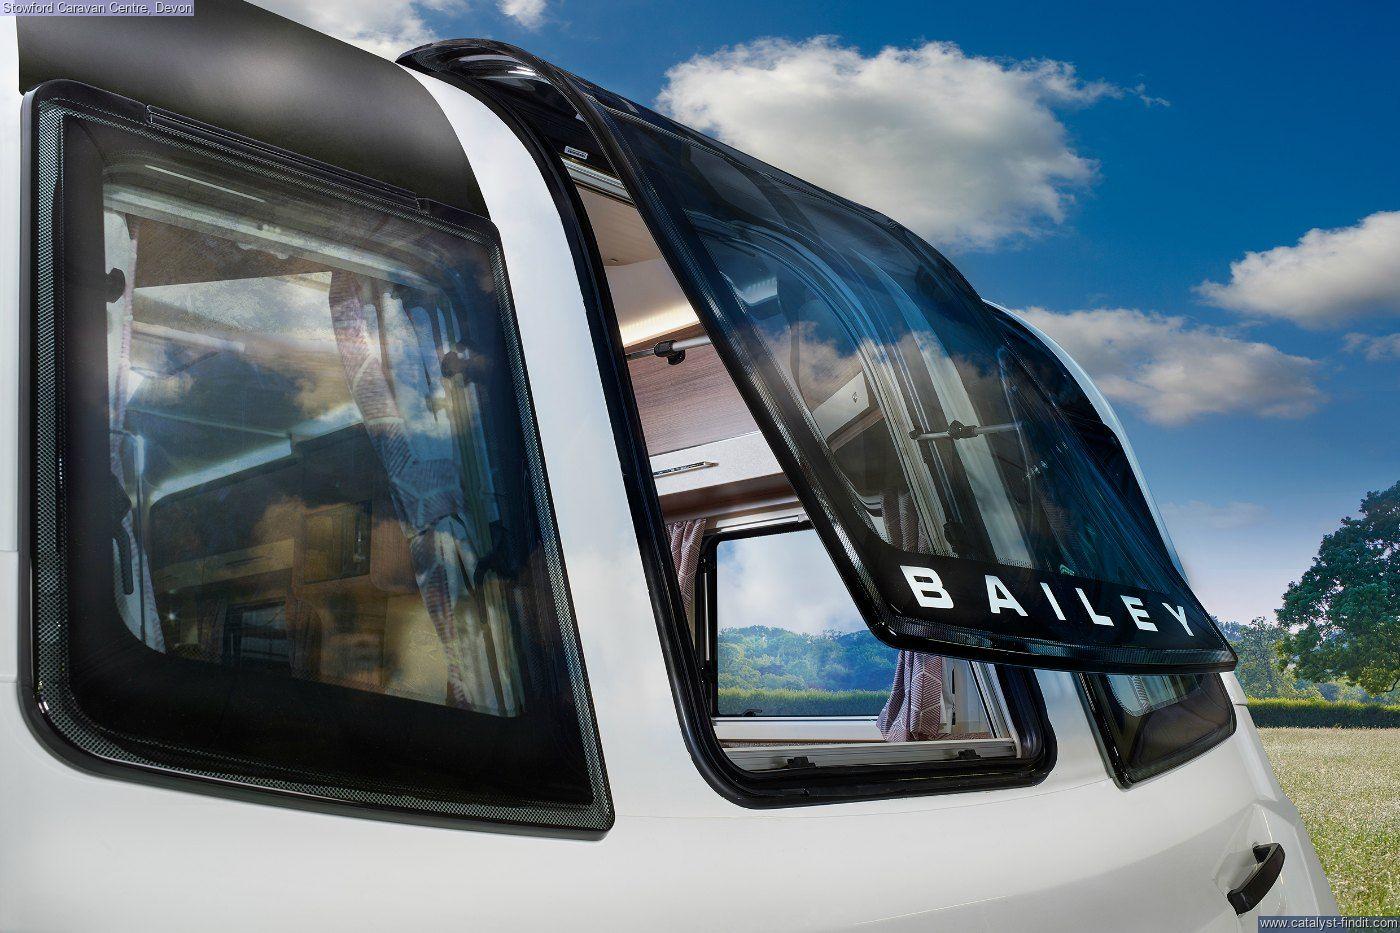 Bailey Pegasus Grande Messina 2019